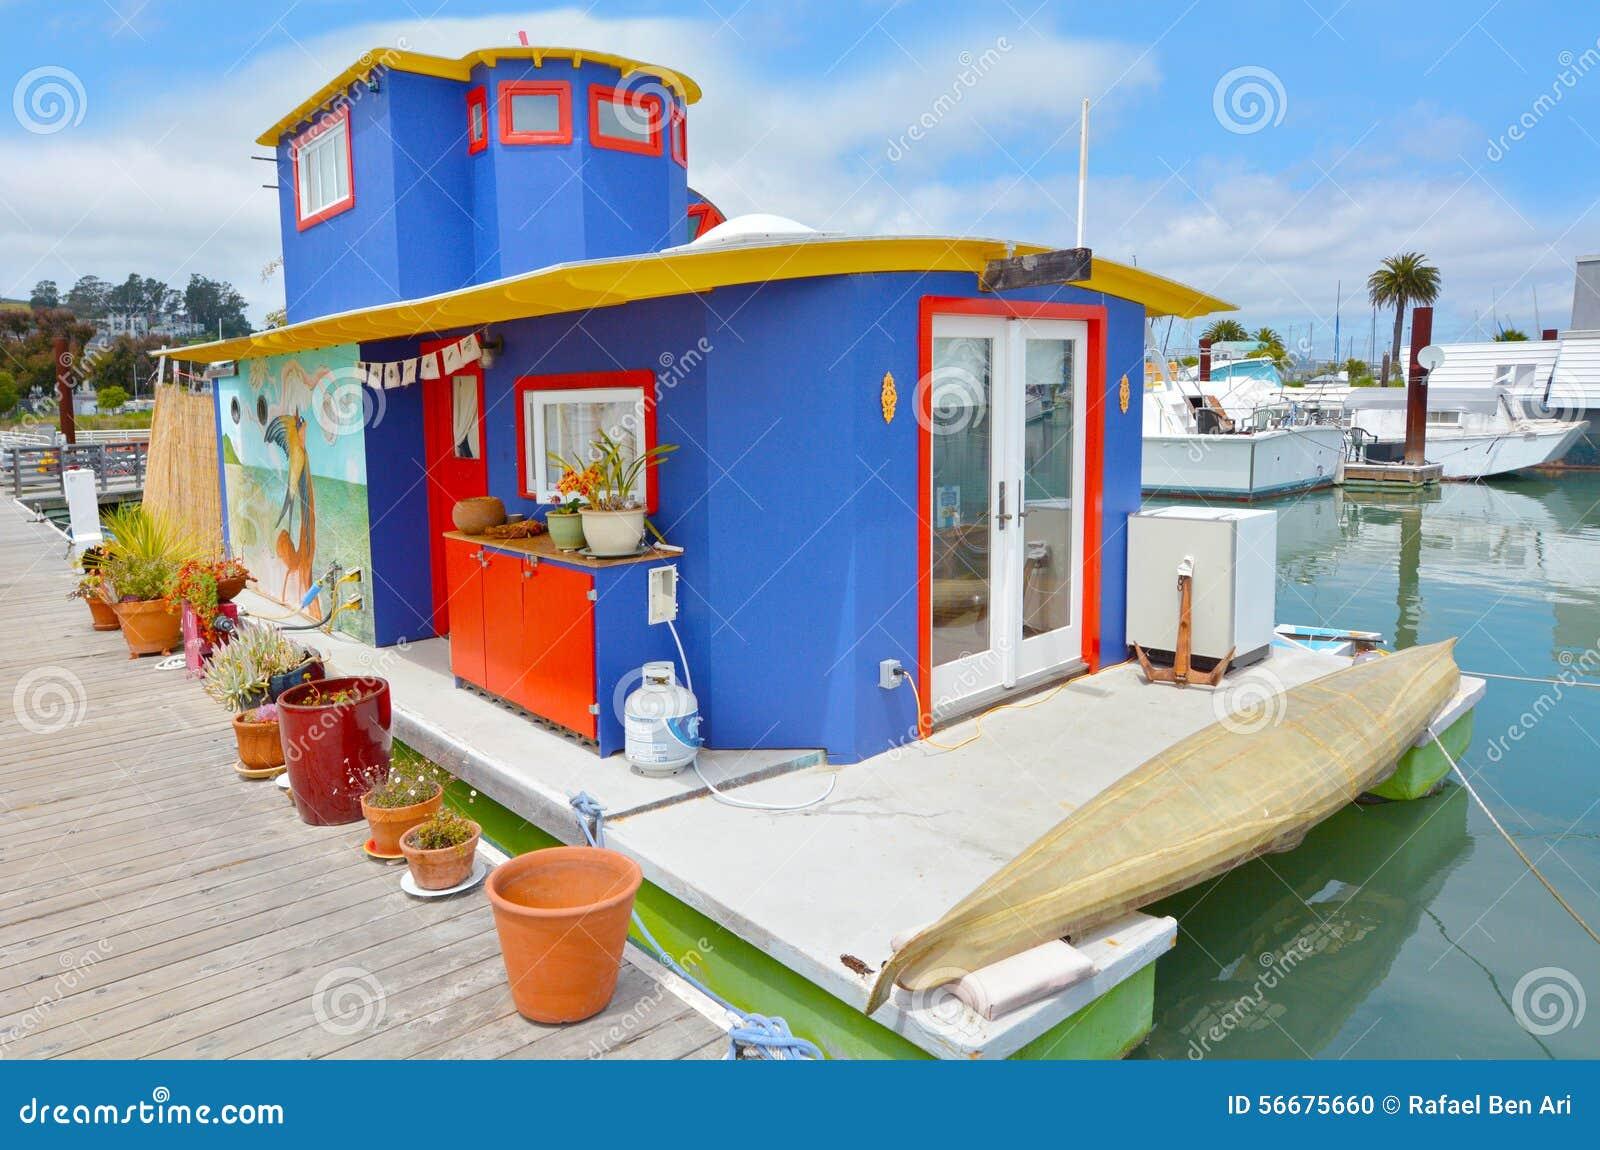 buntes hausboot in sausalito kalifornien stockfoto bild 56675660. Black Bedroom Furniture Sets. Home Design Ideas